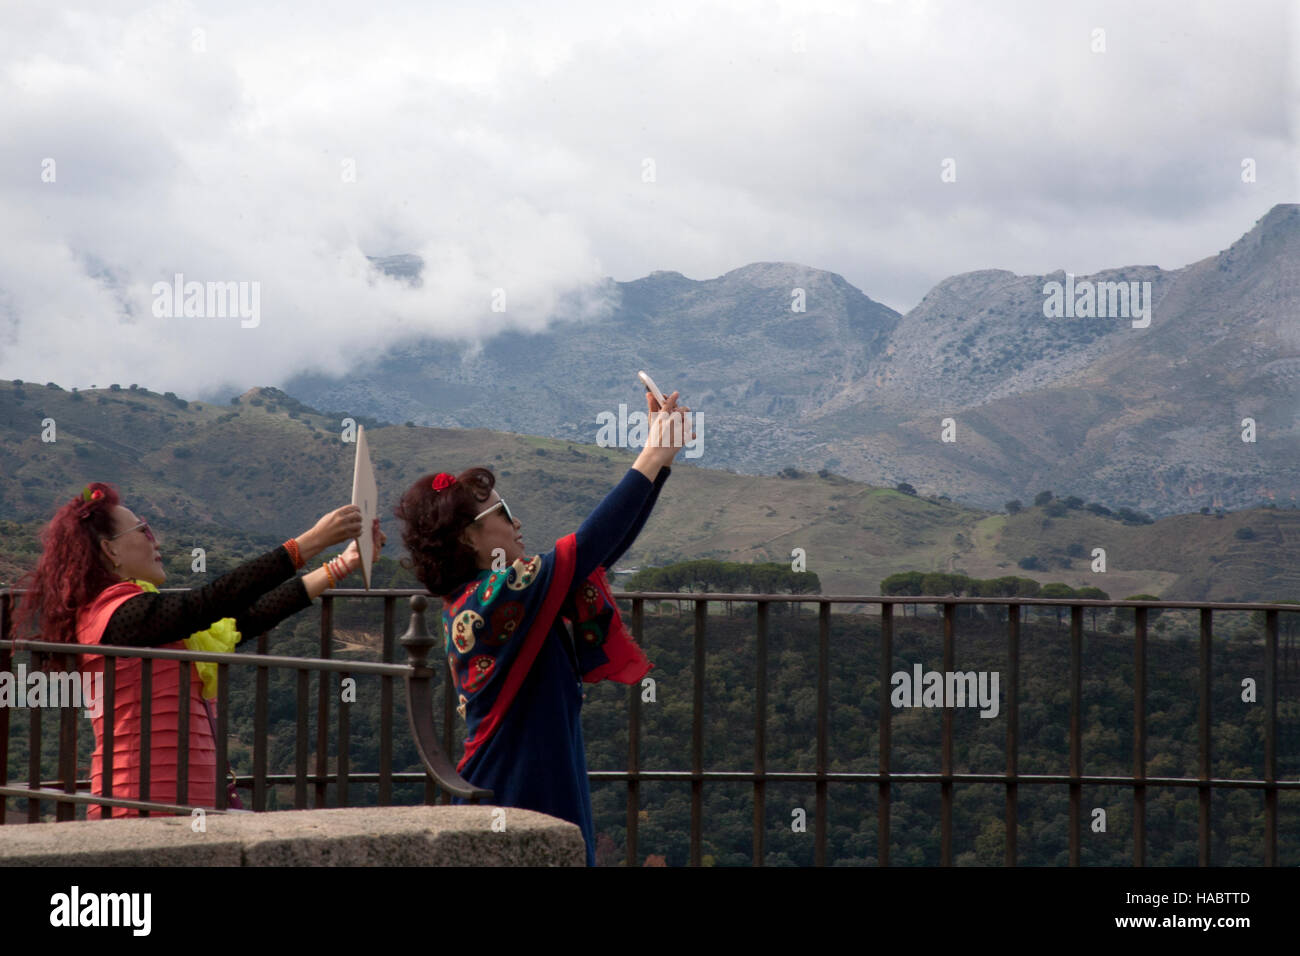 Two tourists taking selfies Serranía de Ronda mountain range, Andalucia Spain - Stock Image